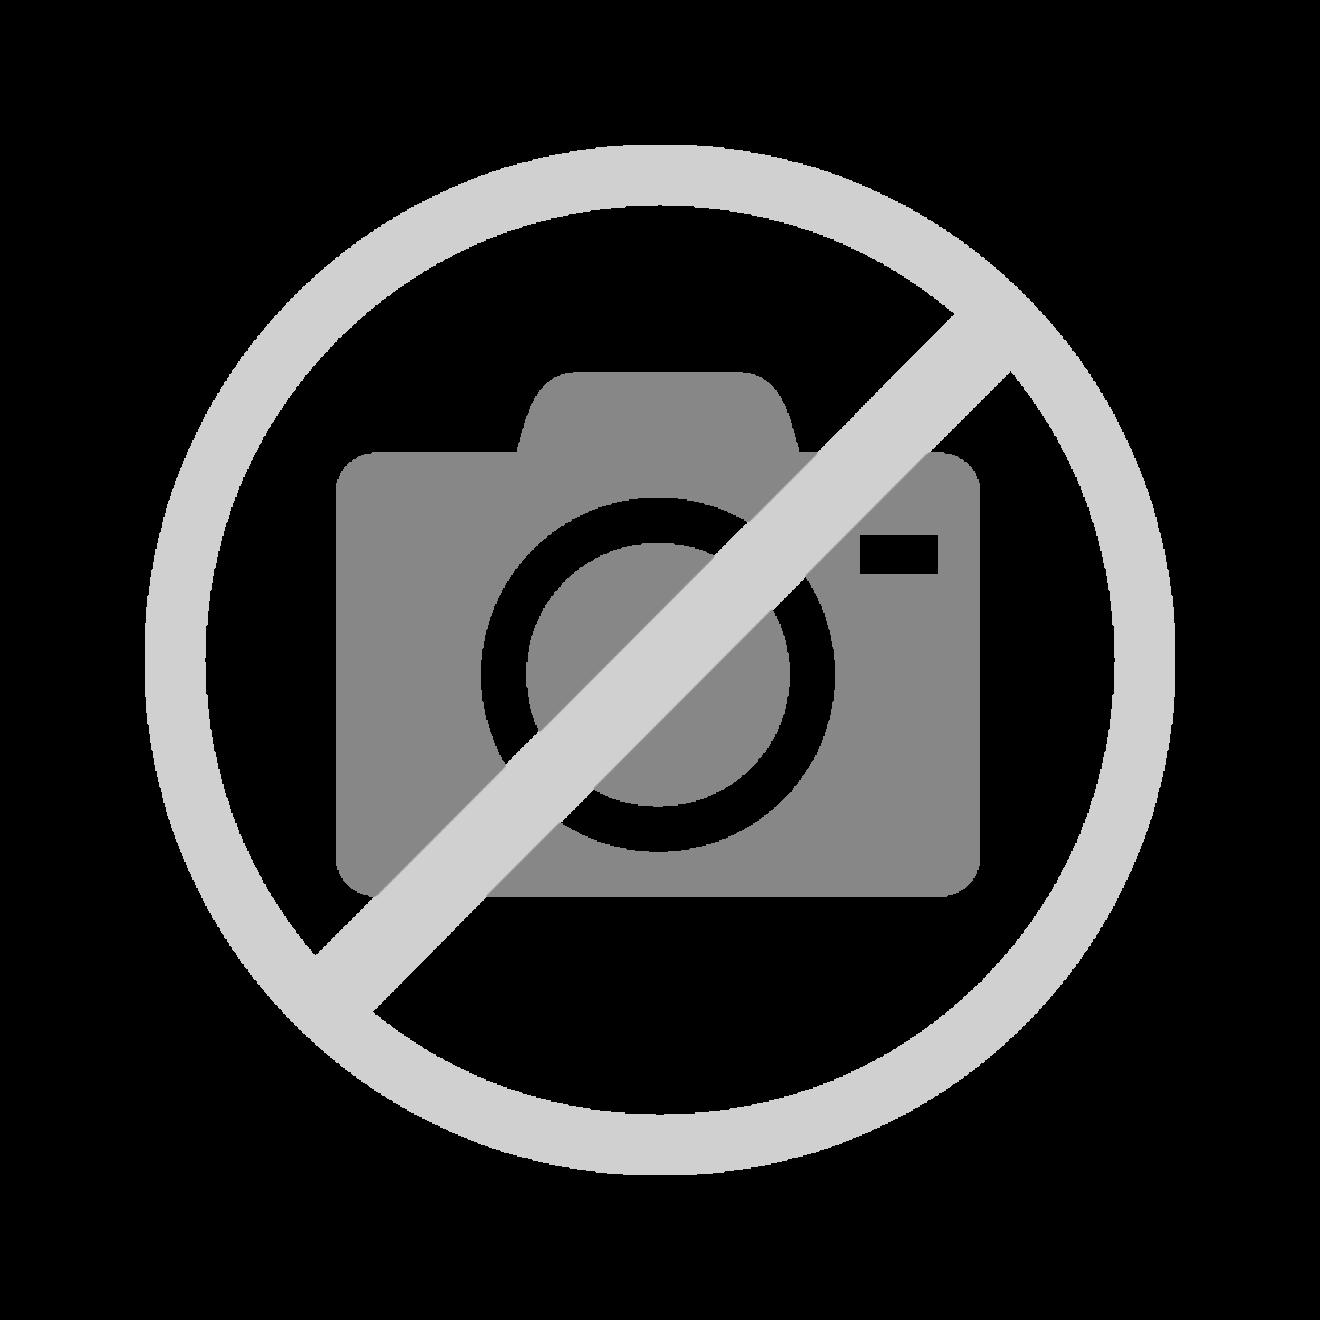 weihnachts berraschungsbox f r gro e hunde weihnachts. Black Bedroom Furniture Sets. Home Design Ideas